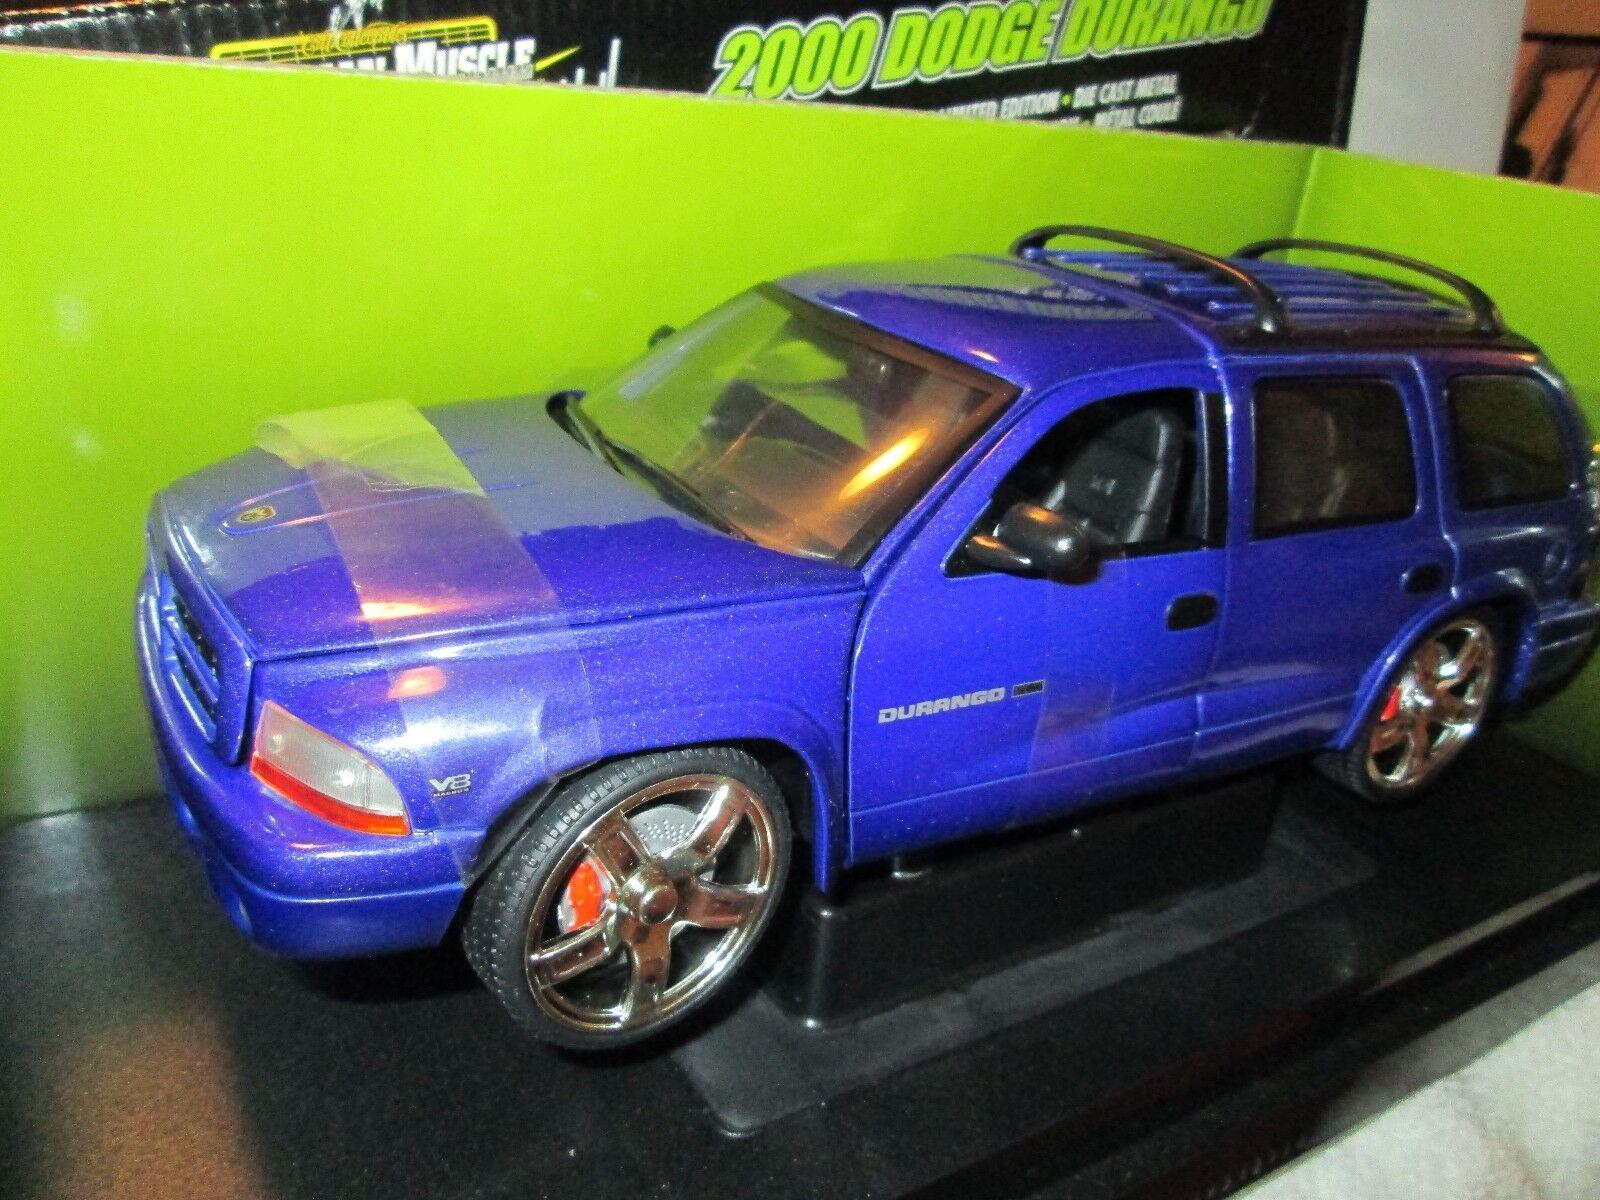 SLAMMED Dodge durango purple 2000 hobby edition 1 of 5000 1/18 american muscle